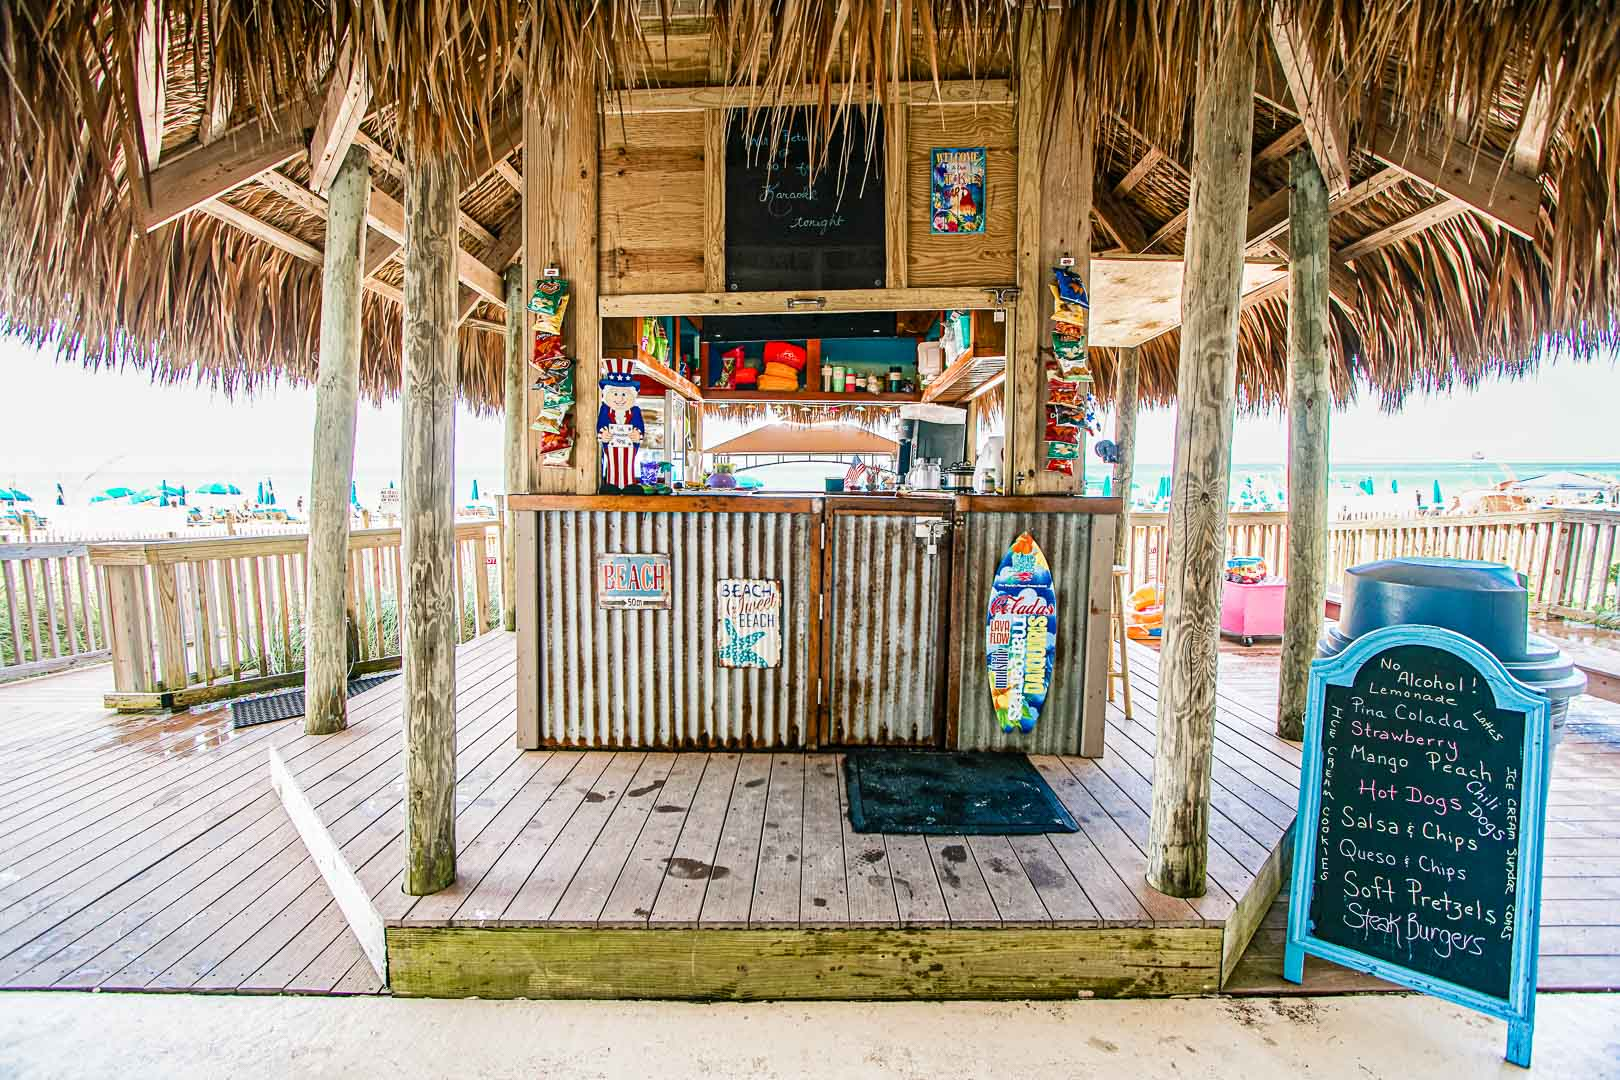 The onsite restaurant at VRI's Landmark Holiday Beach Resort in Panama City, Florida.